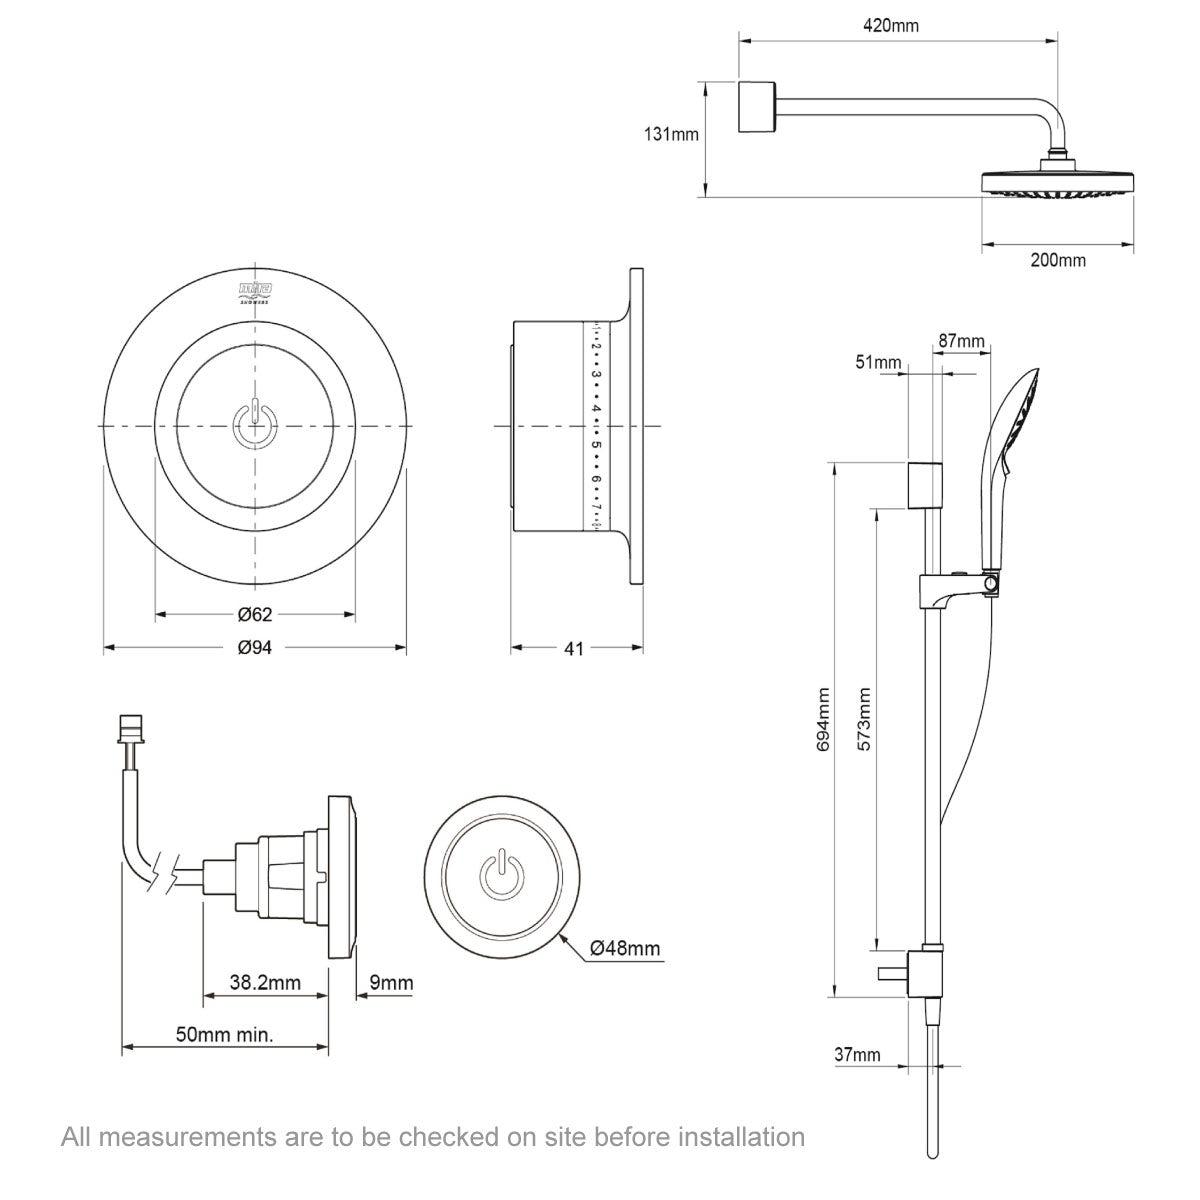 Dimensions for Mira Mode dual rear fed digital shower standard